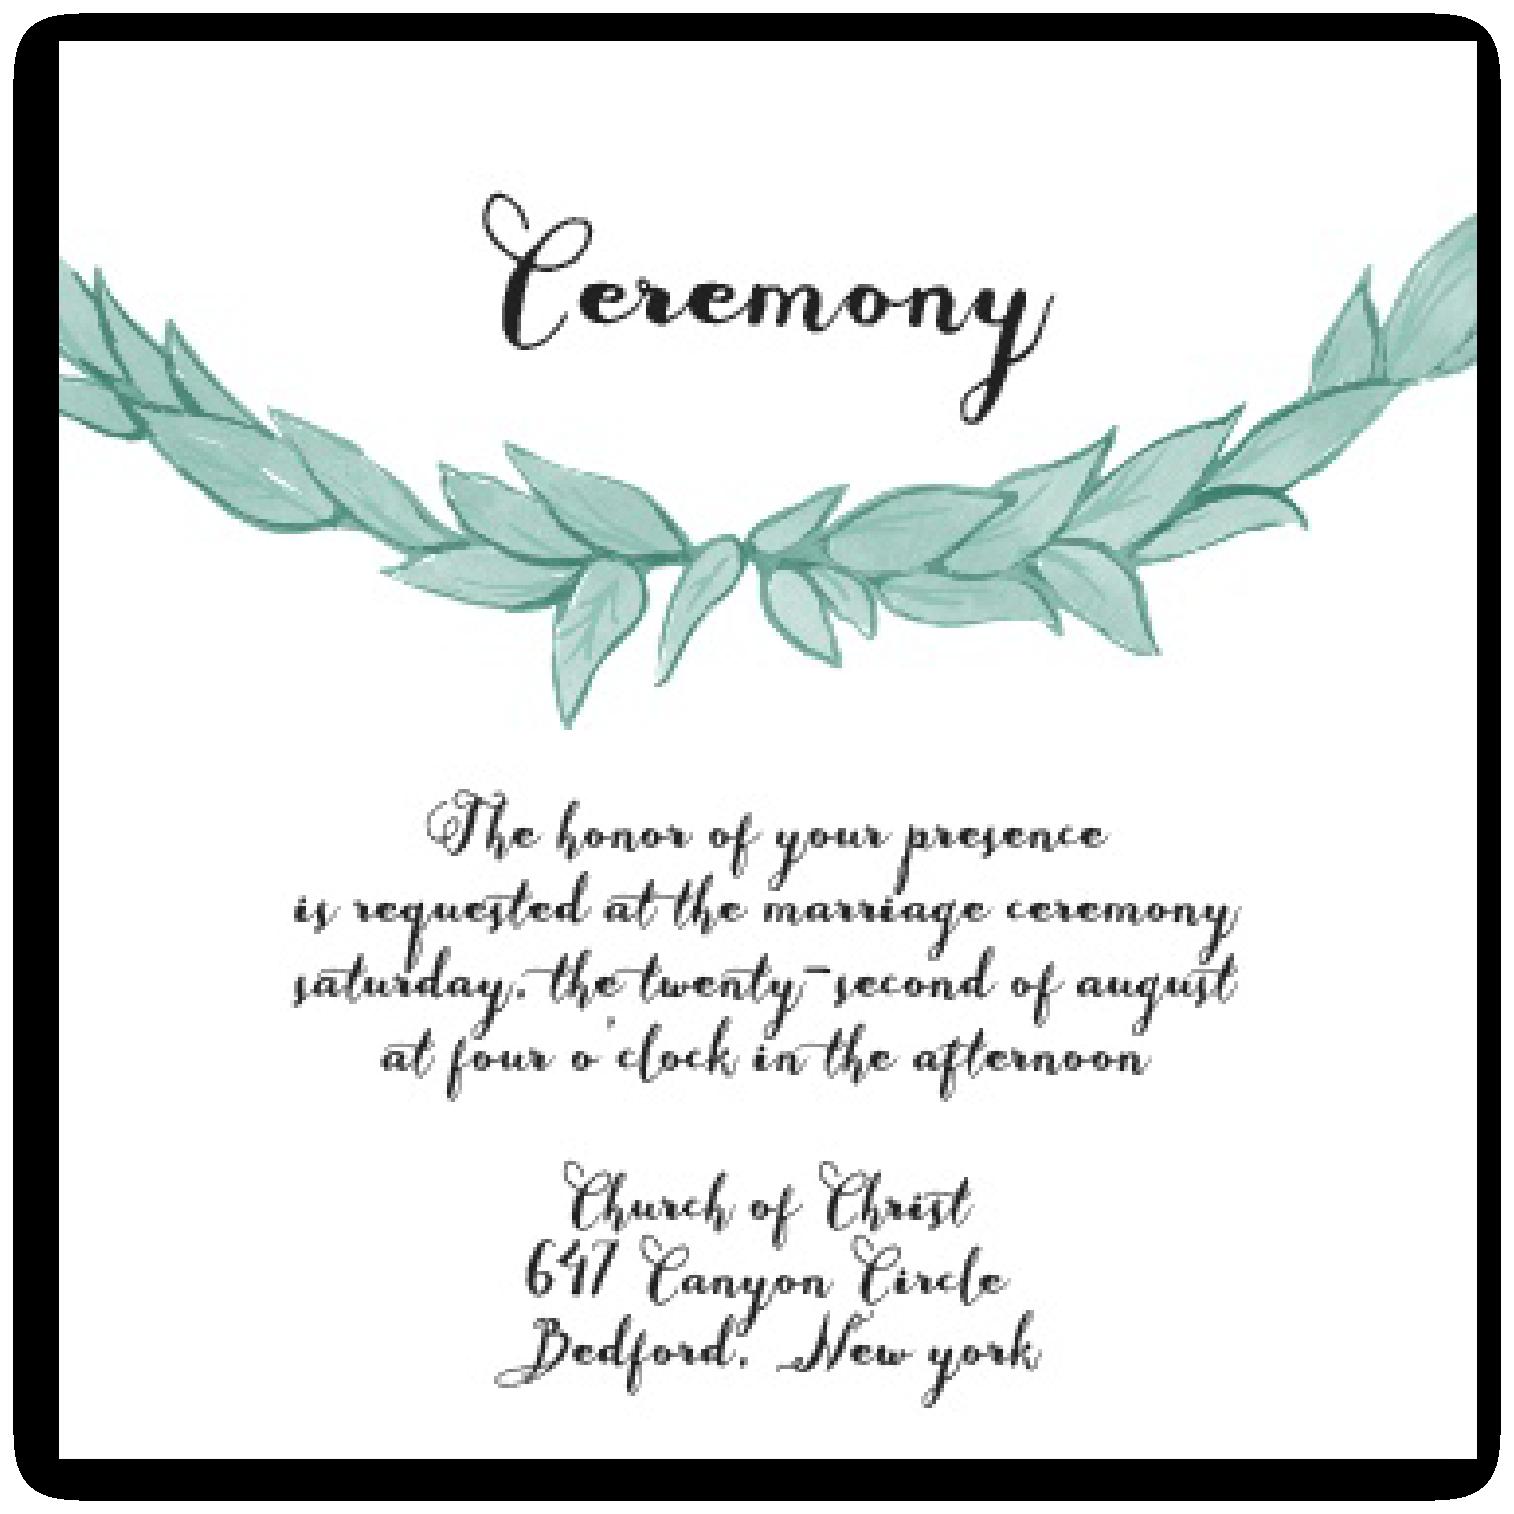 Ceremony Card Wording